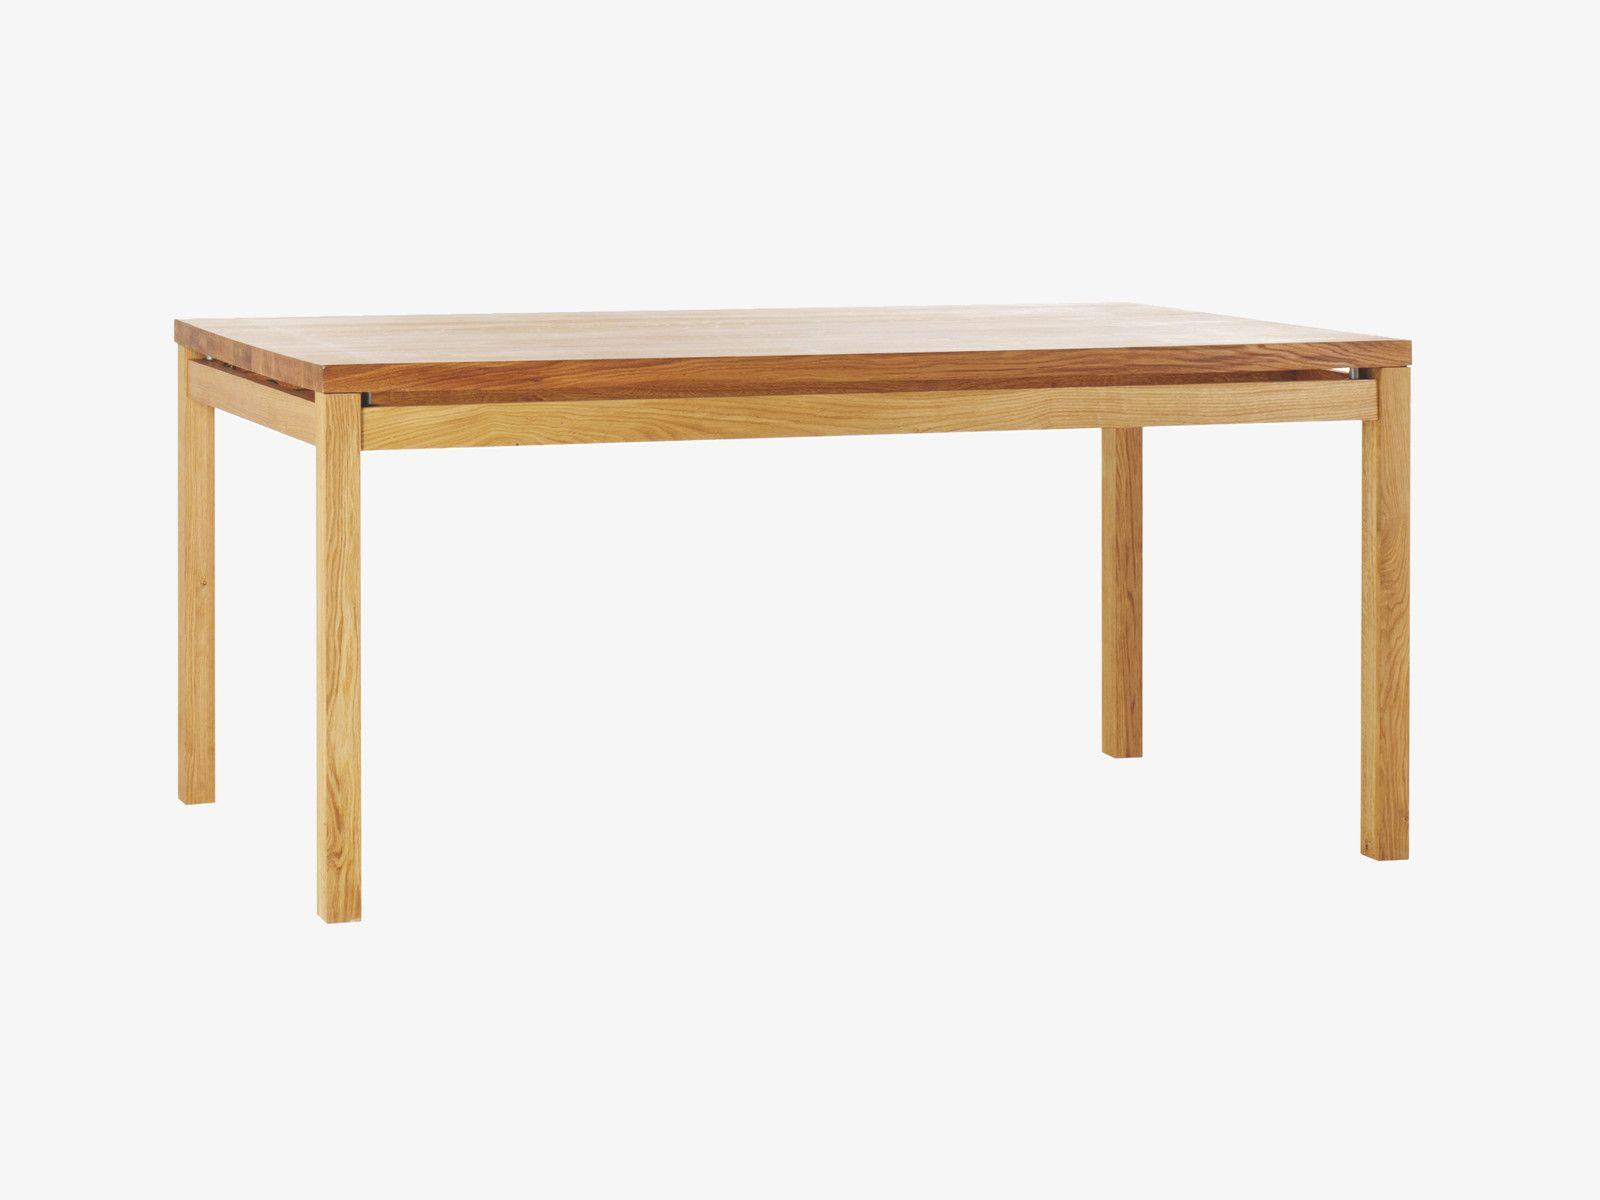 Massello oak table habitat g pinterest oak table dining massello oak table habitat geotapseo Gallery